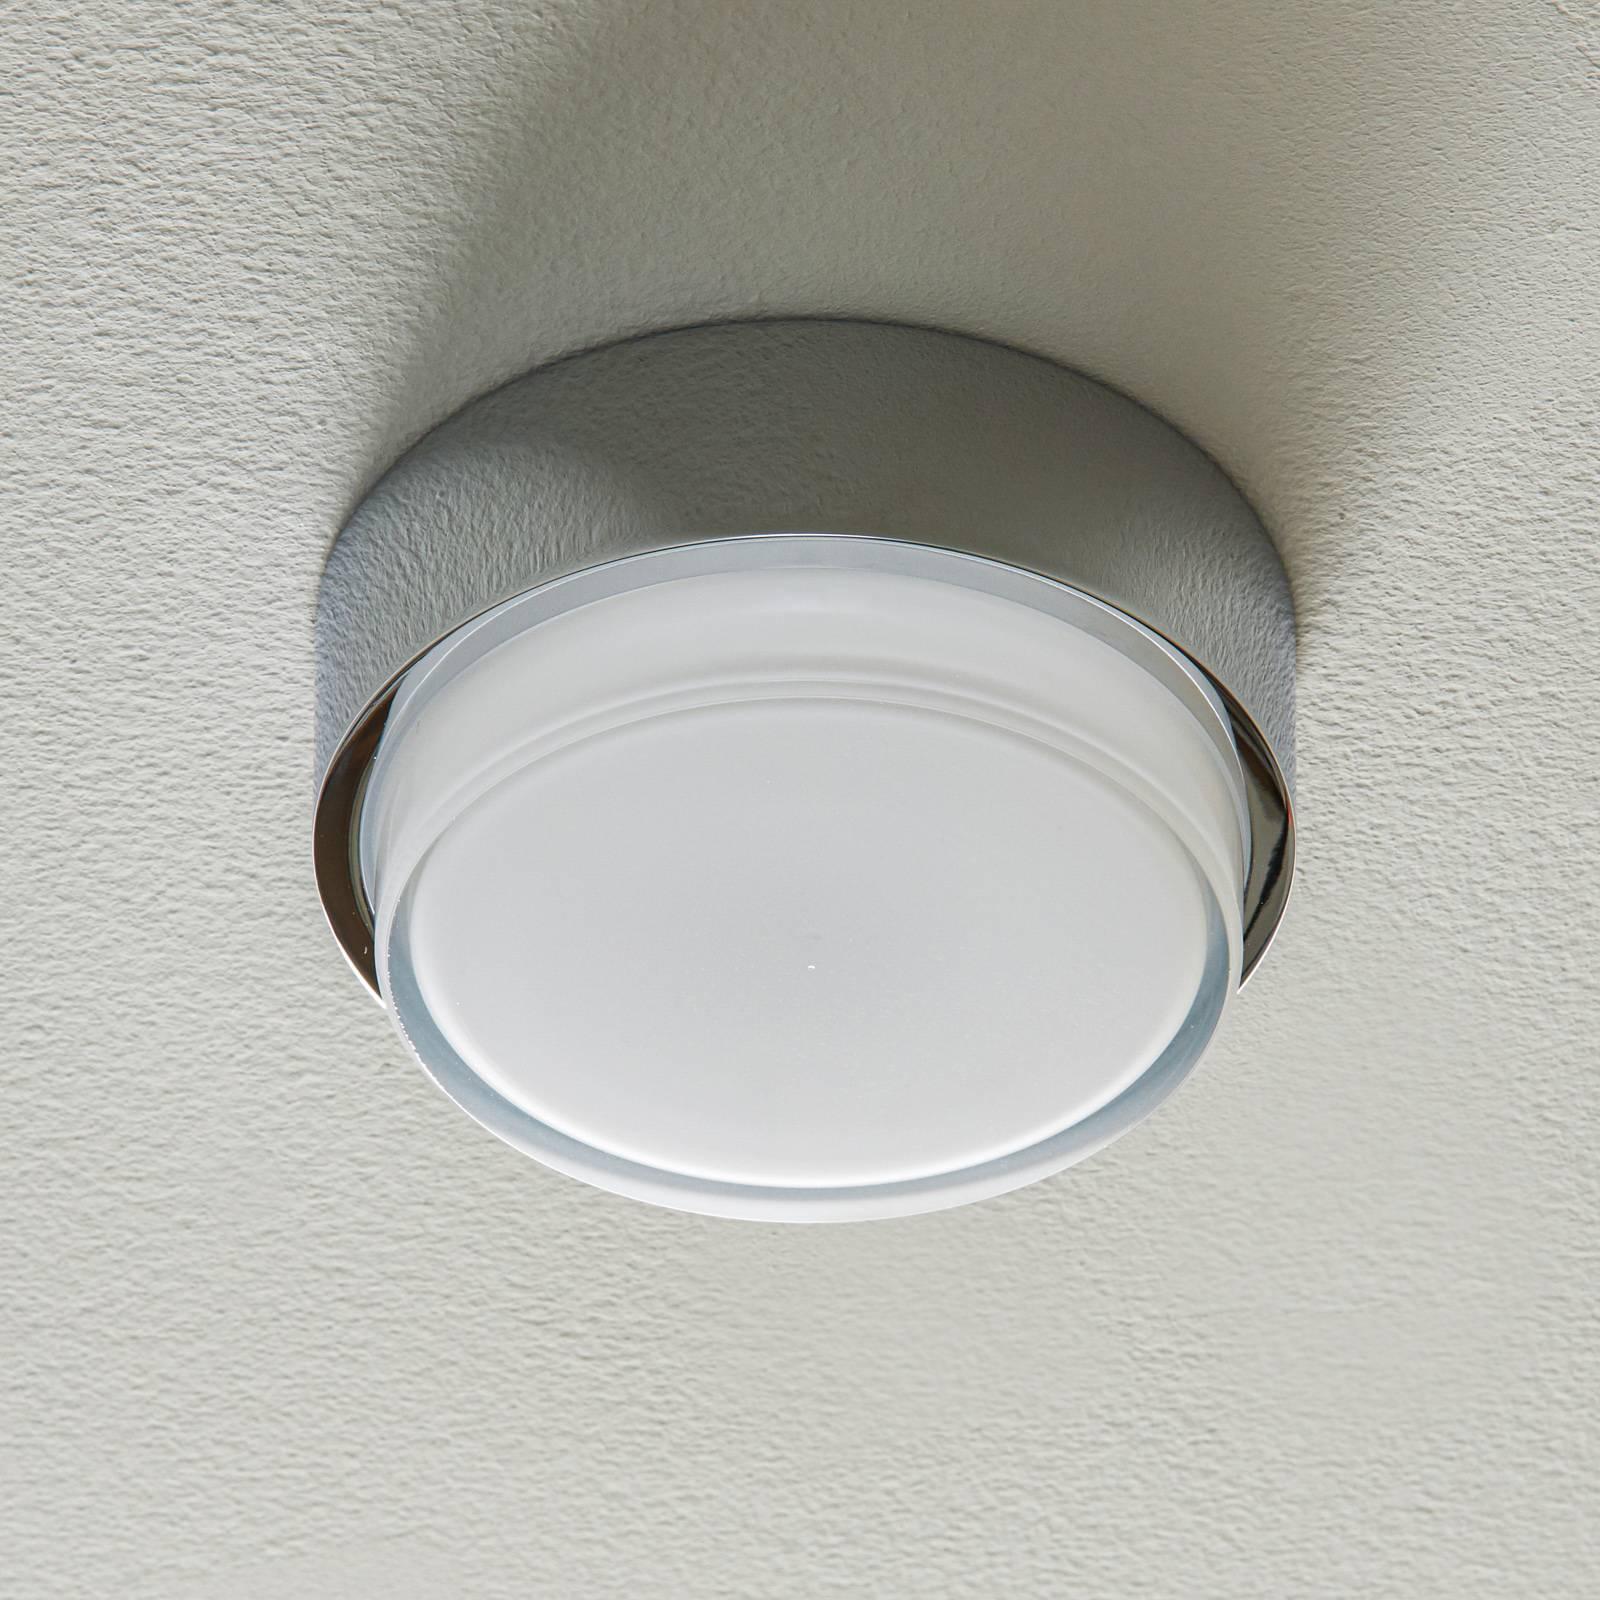 BEGA 50535 LED-kattovalaisin 930 kromi Ø15,5cm